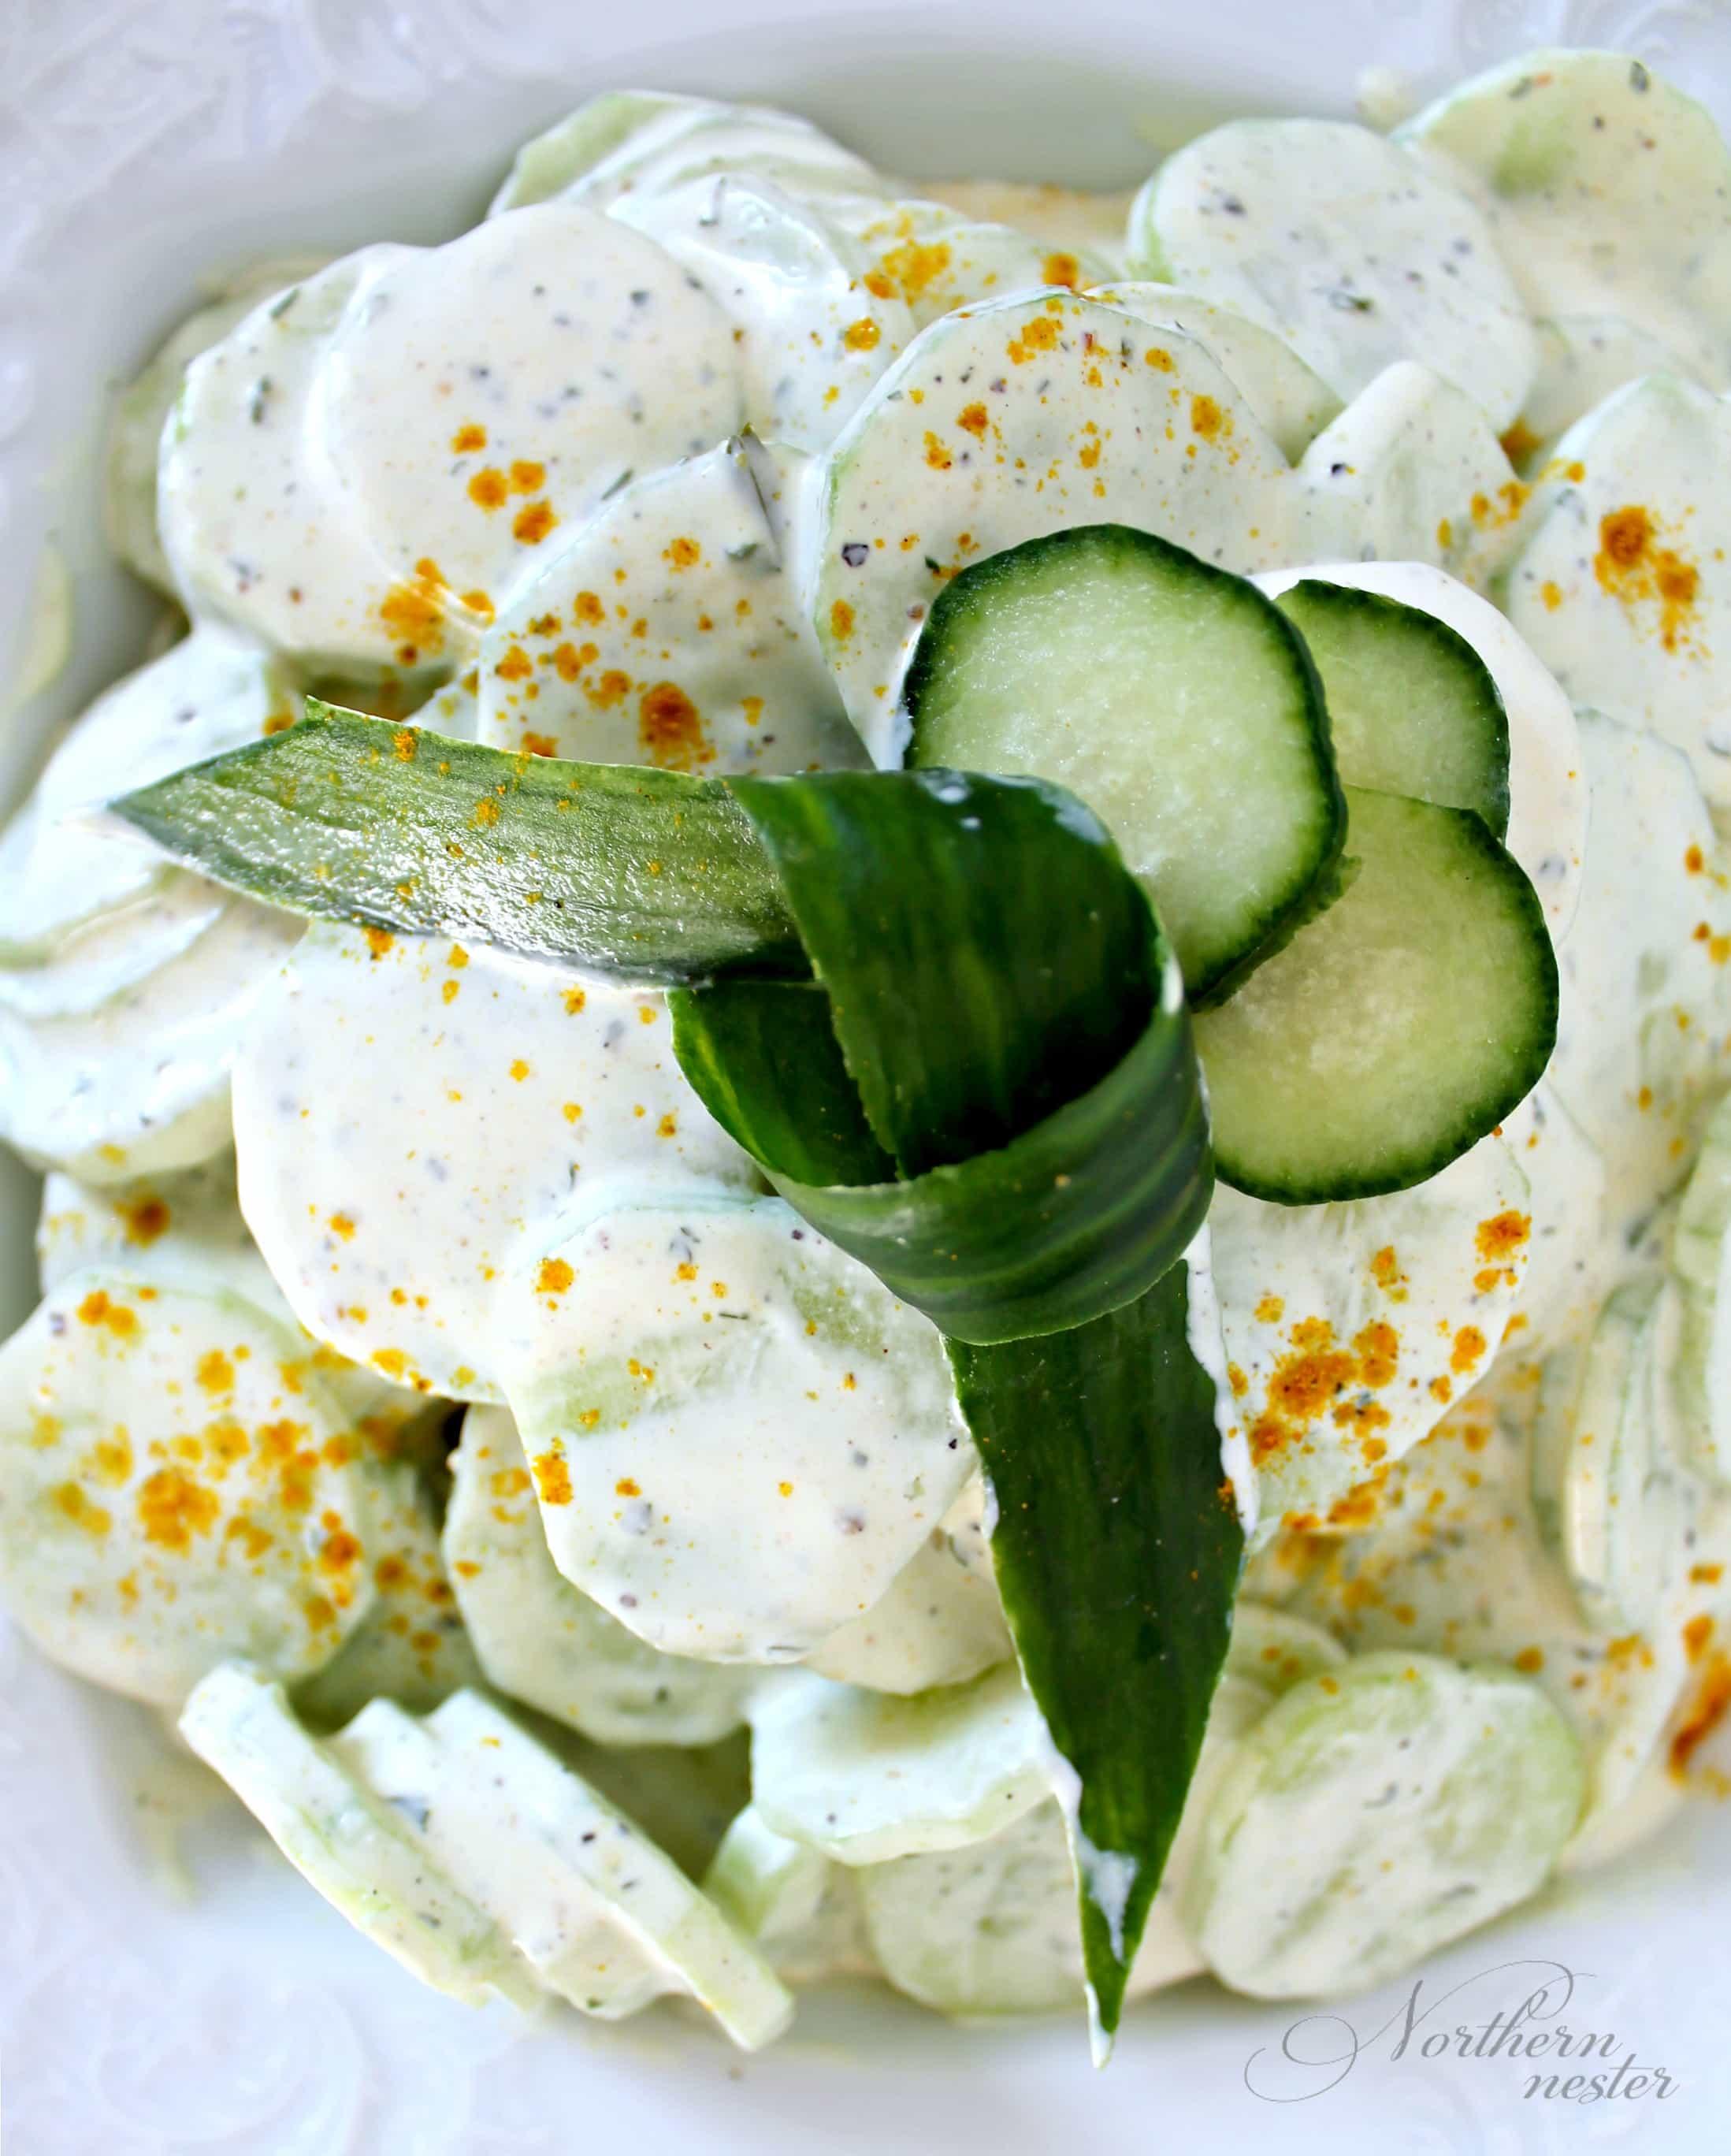 Curried Cucumber Salad